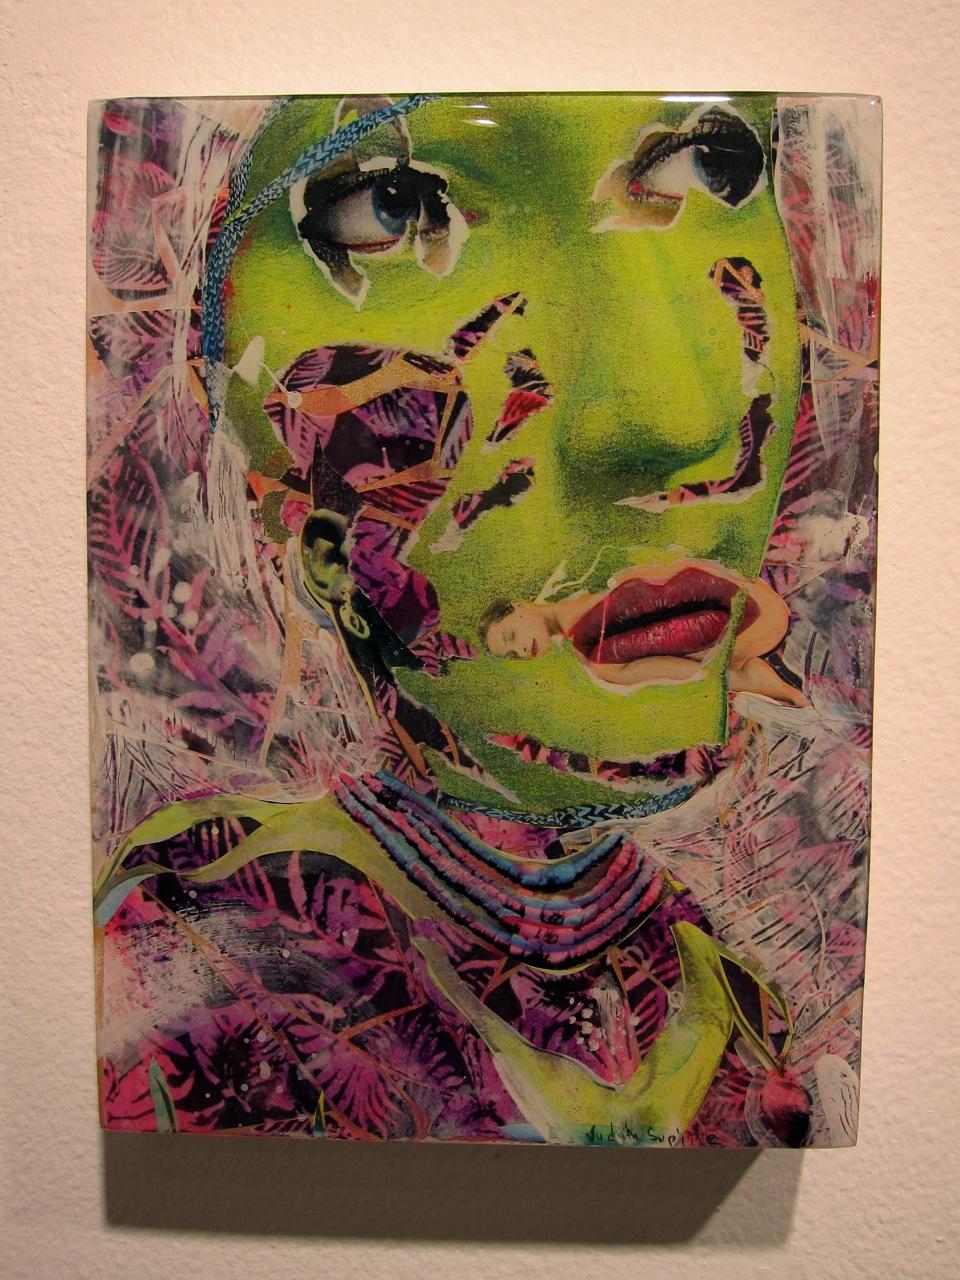 Judith Supine Jonathan Levine AM 01